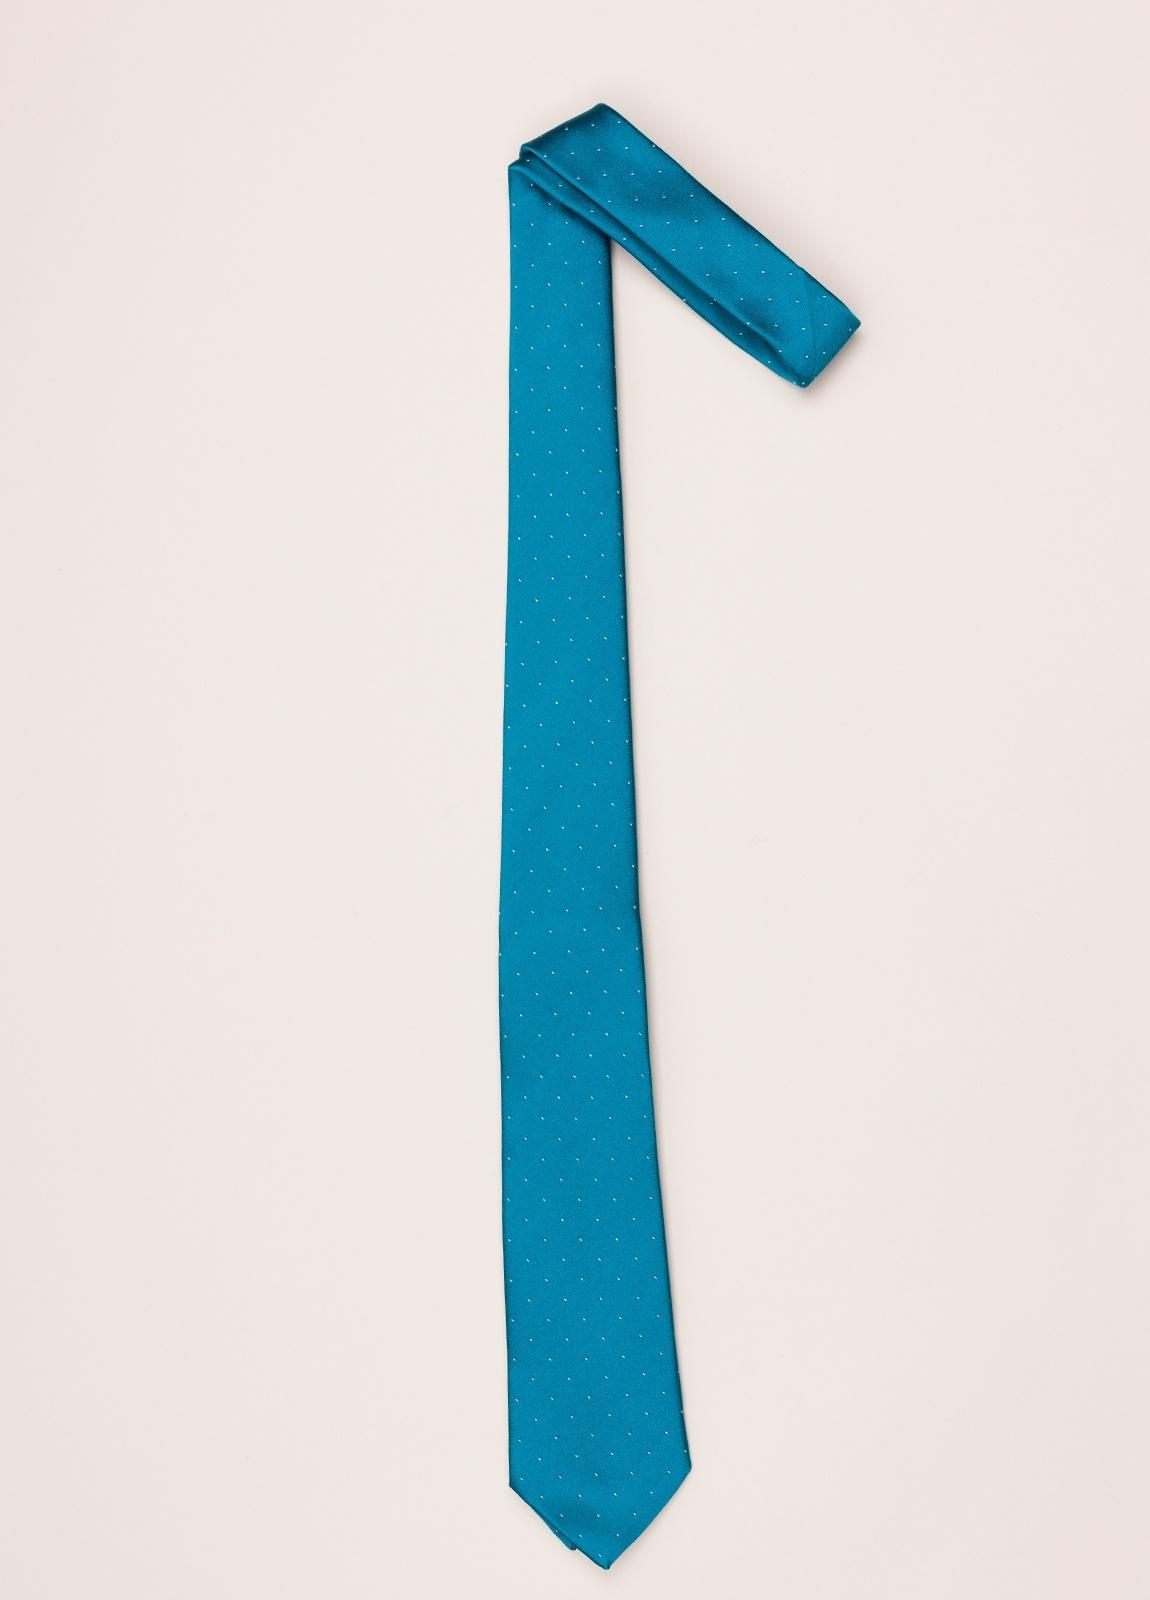 Corbata FUREST COLECCIÓN azul turquesa - Ítem1